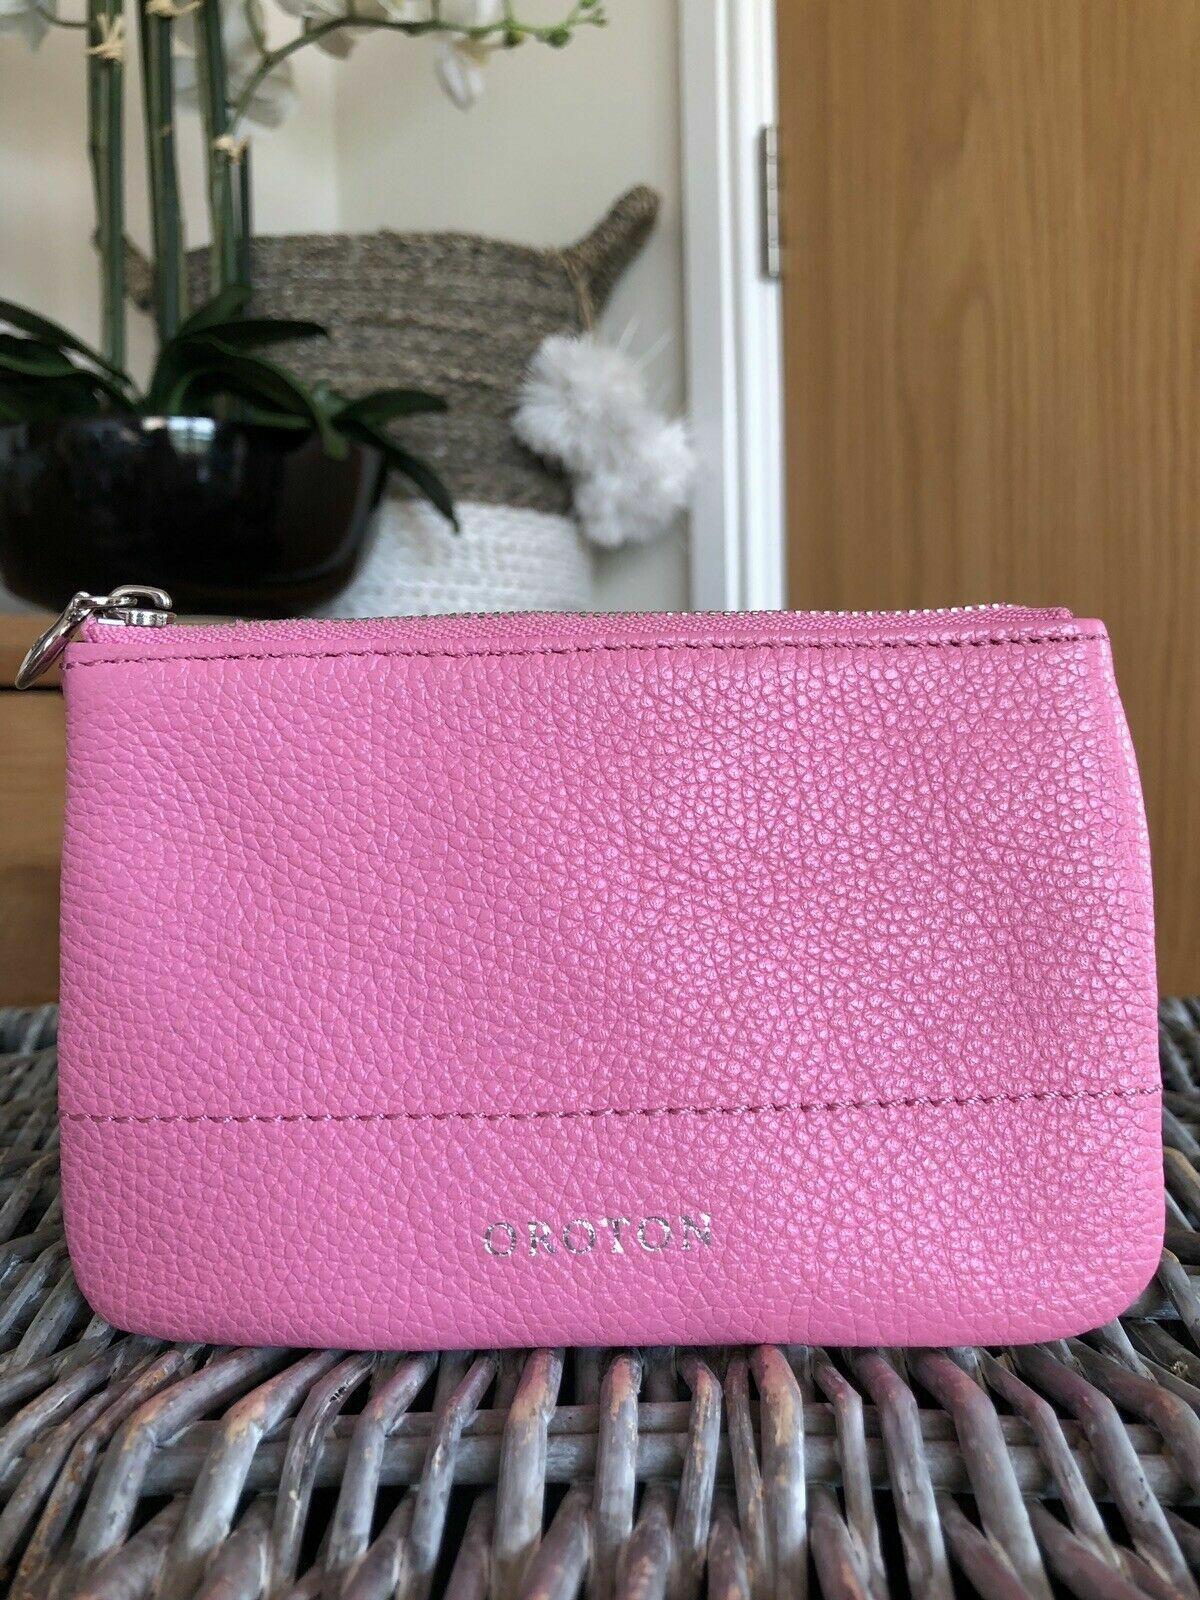 OROTON Pink Genuine Leather Coin Purse vgc